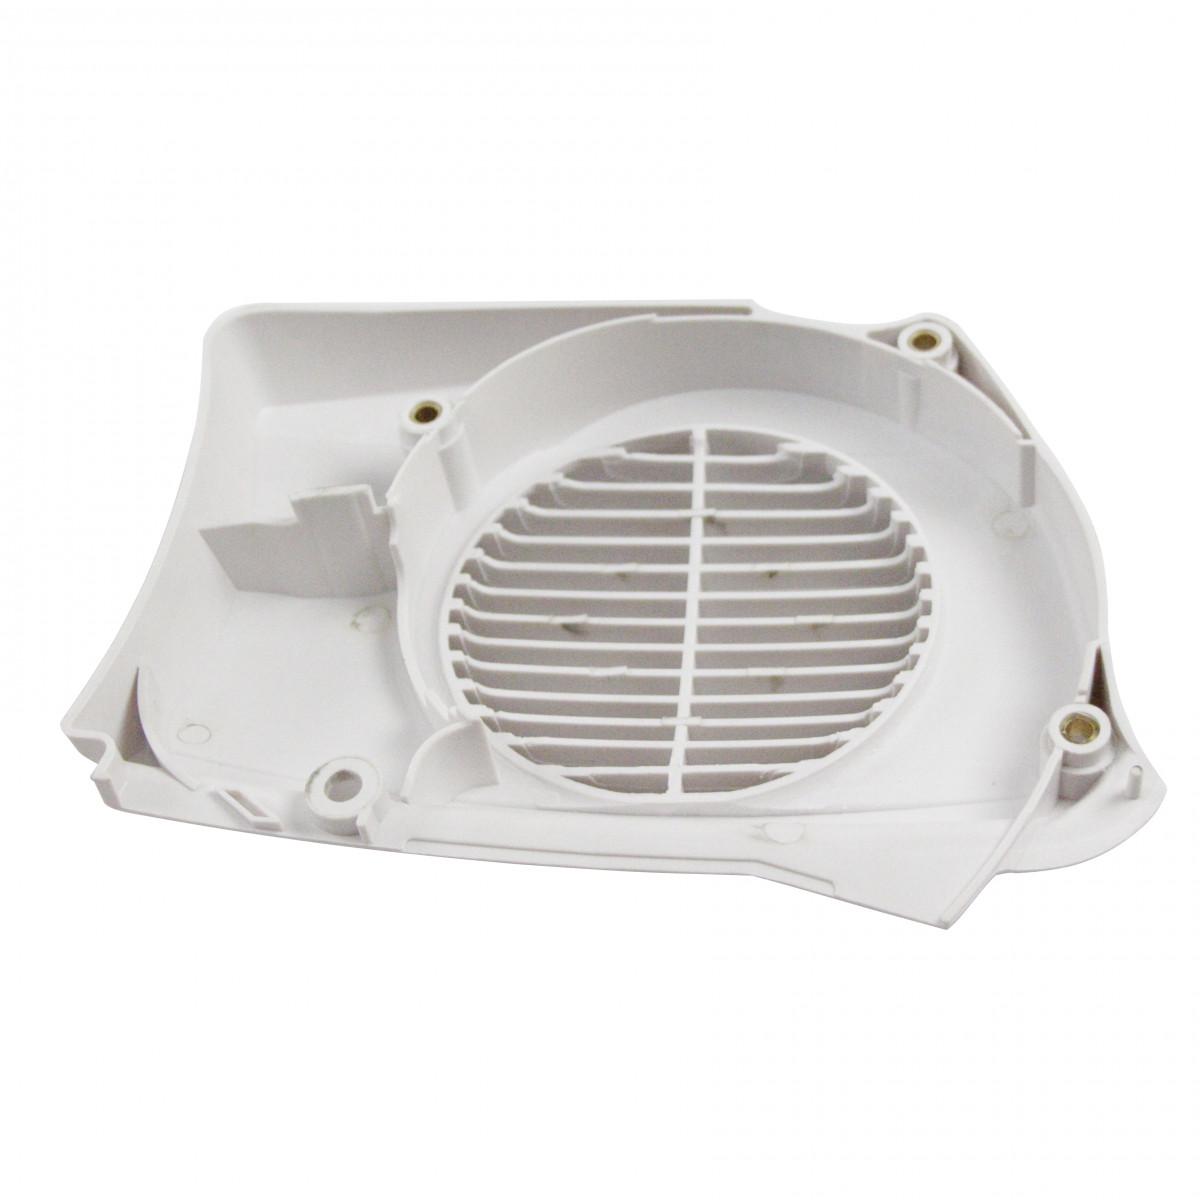 Kryt ventilátor Stihl TS410 TS 410 TS420 TS 420 (4238 080 3100)